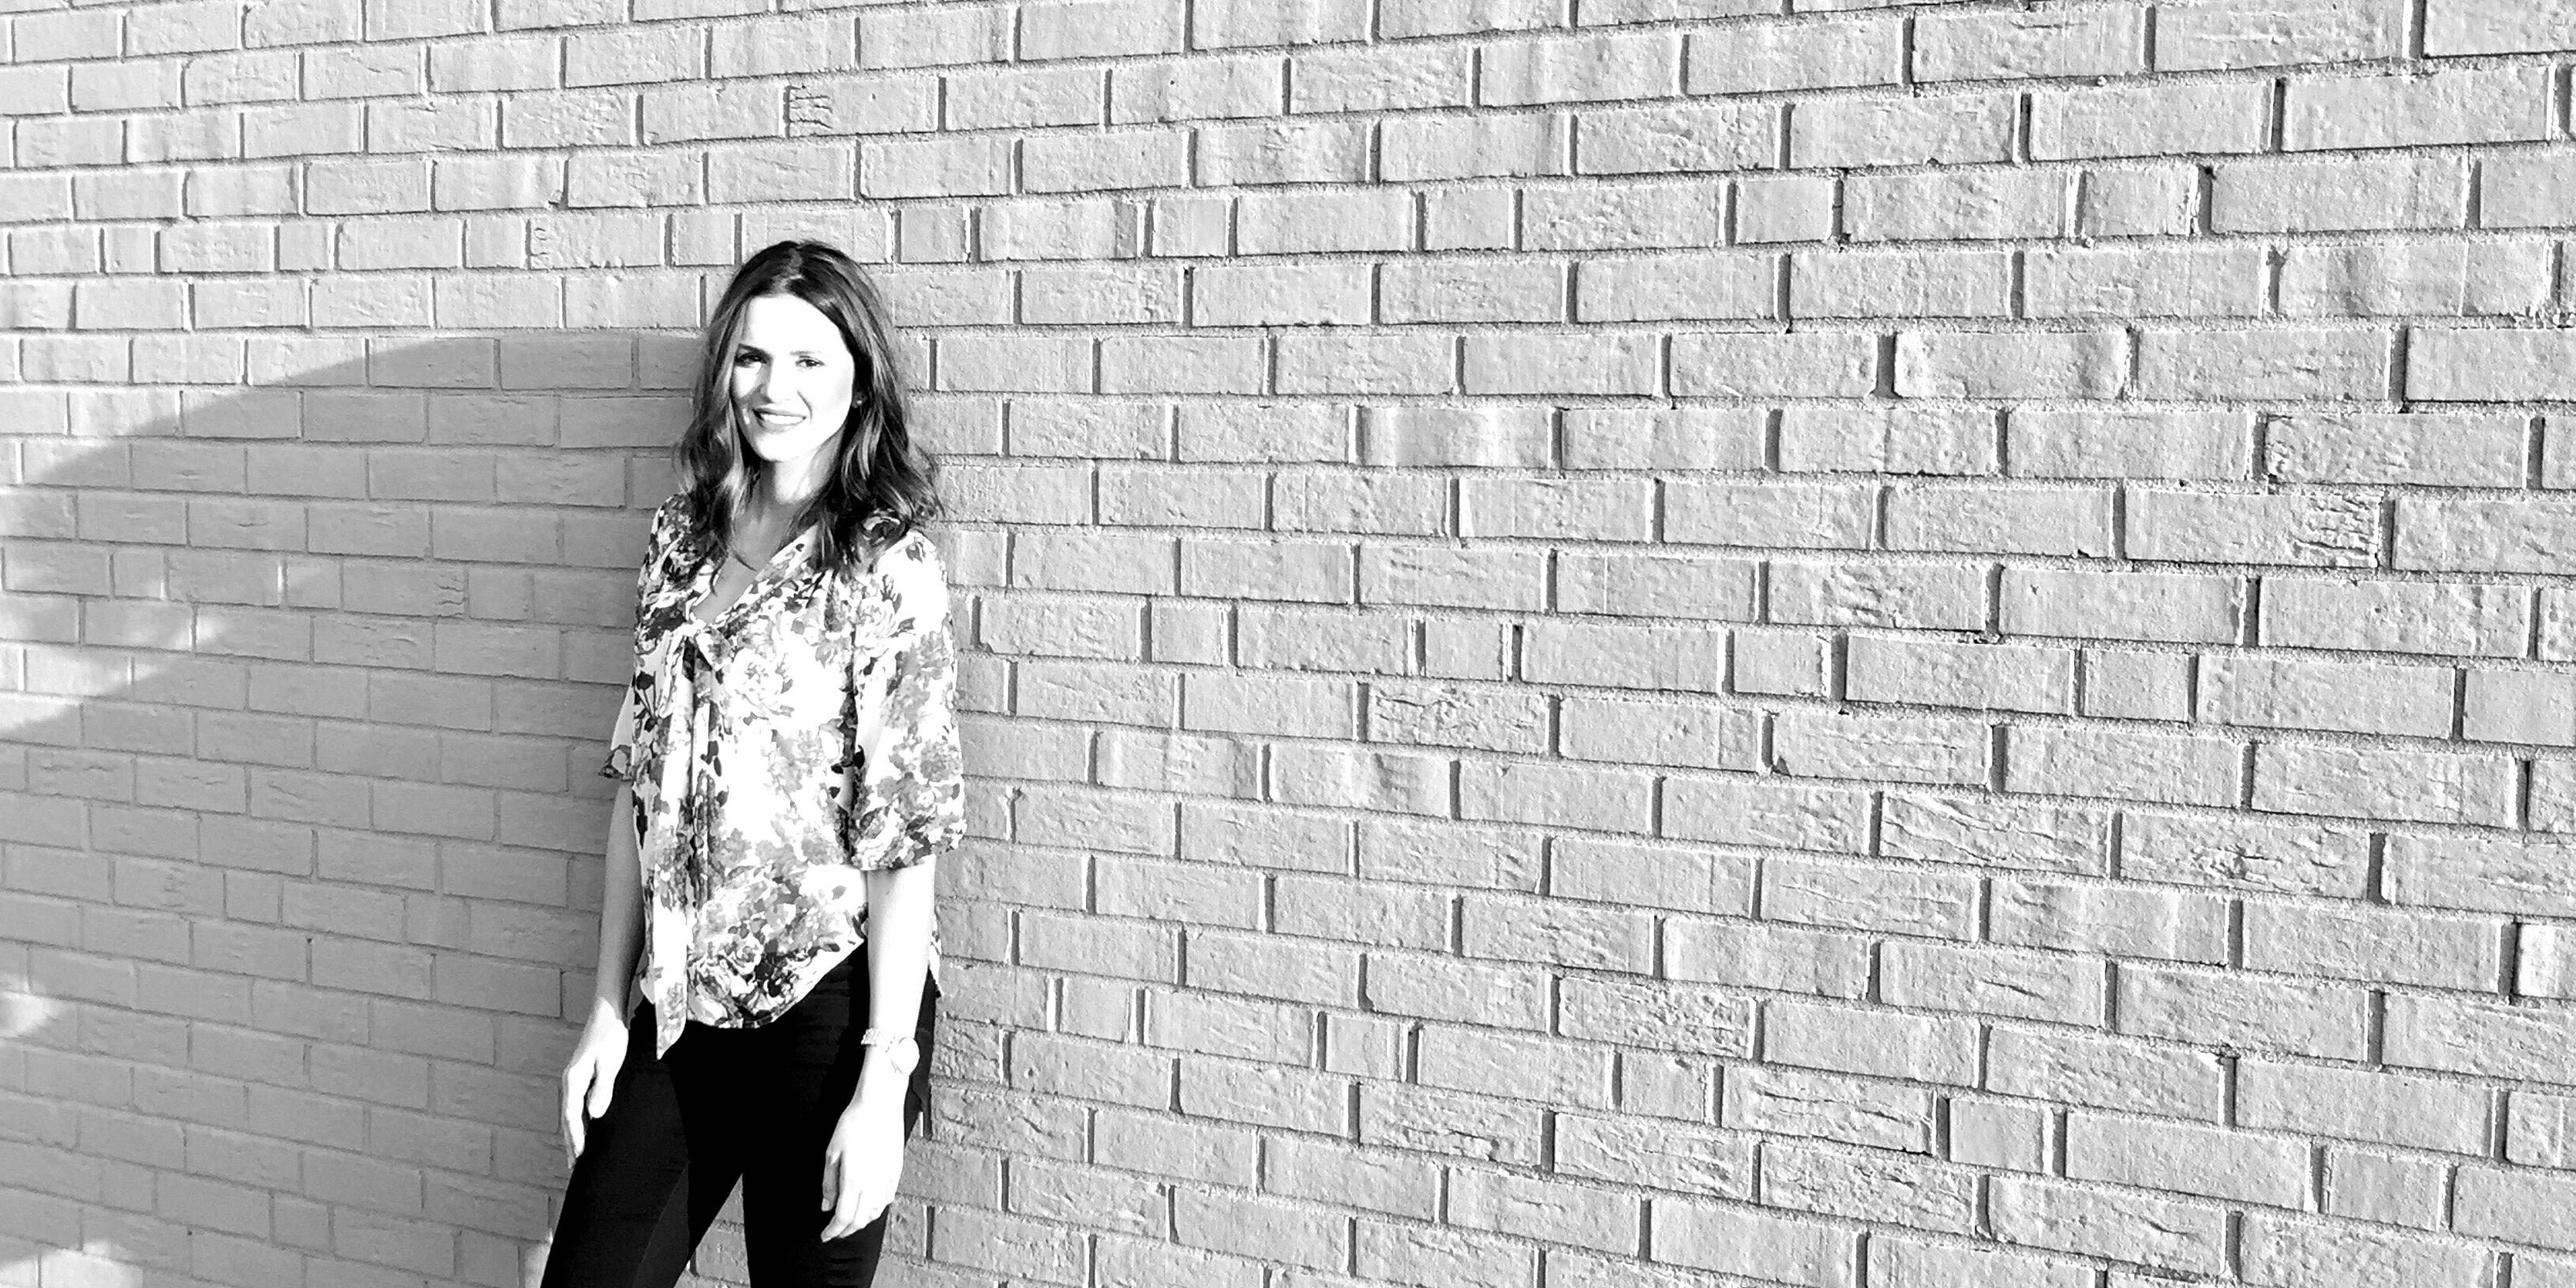 d061729a3b0d Burkhart Marketing Kati Blair standing in front of gray brick wall